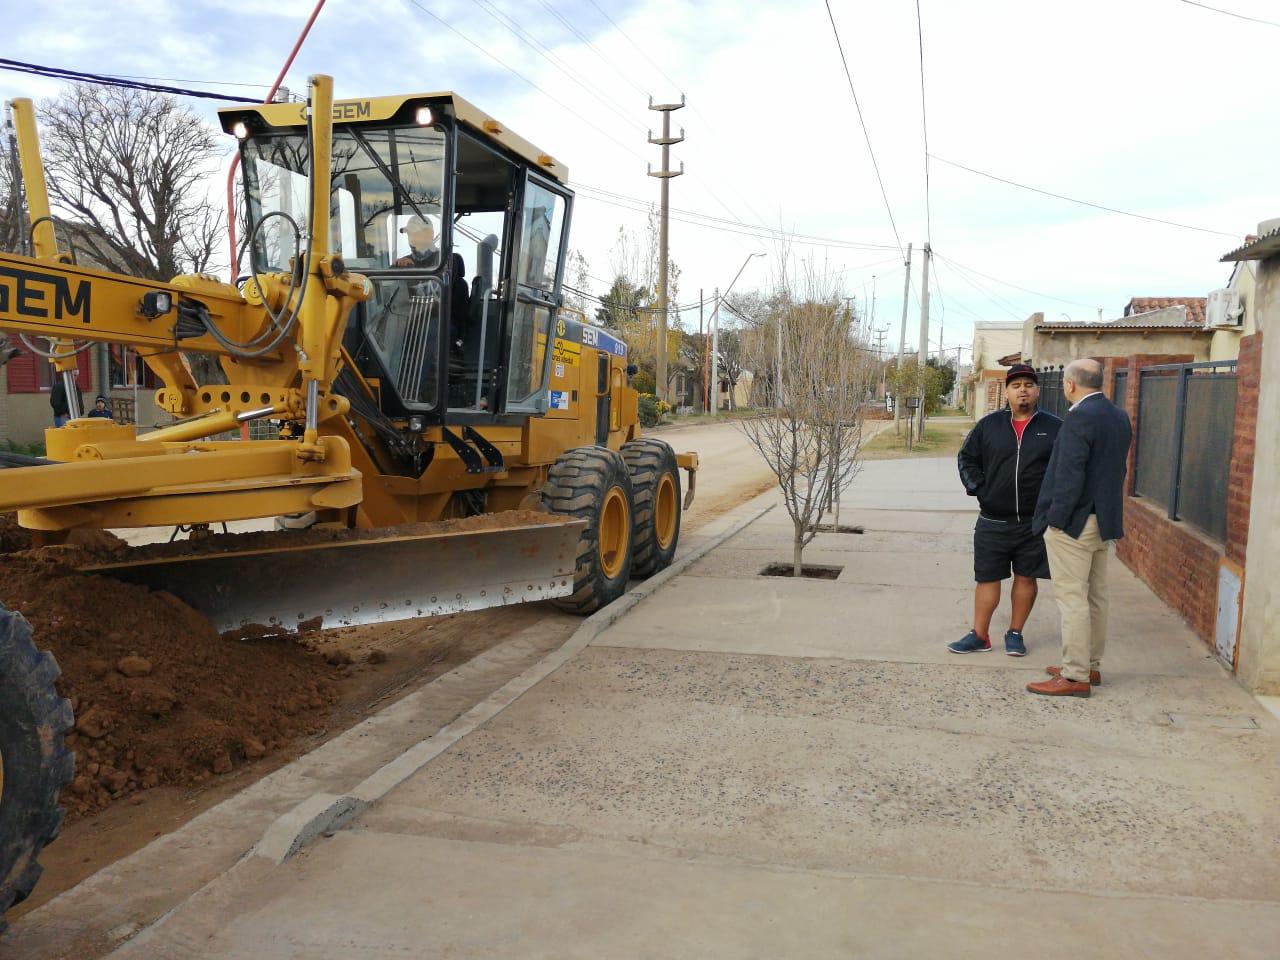 Uset visitó la obra de pavimentación de calle Buchardo